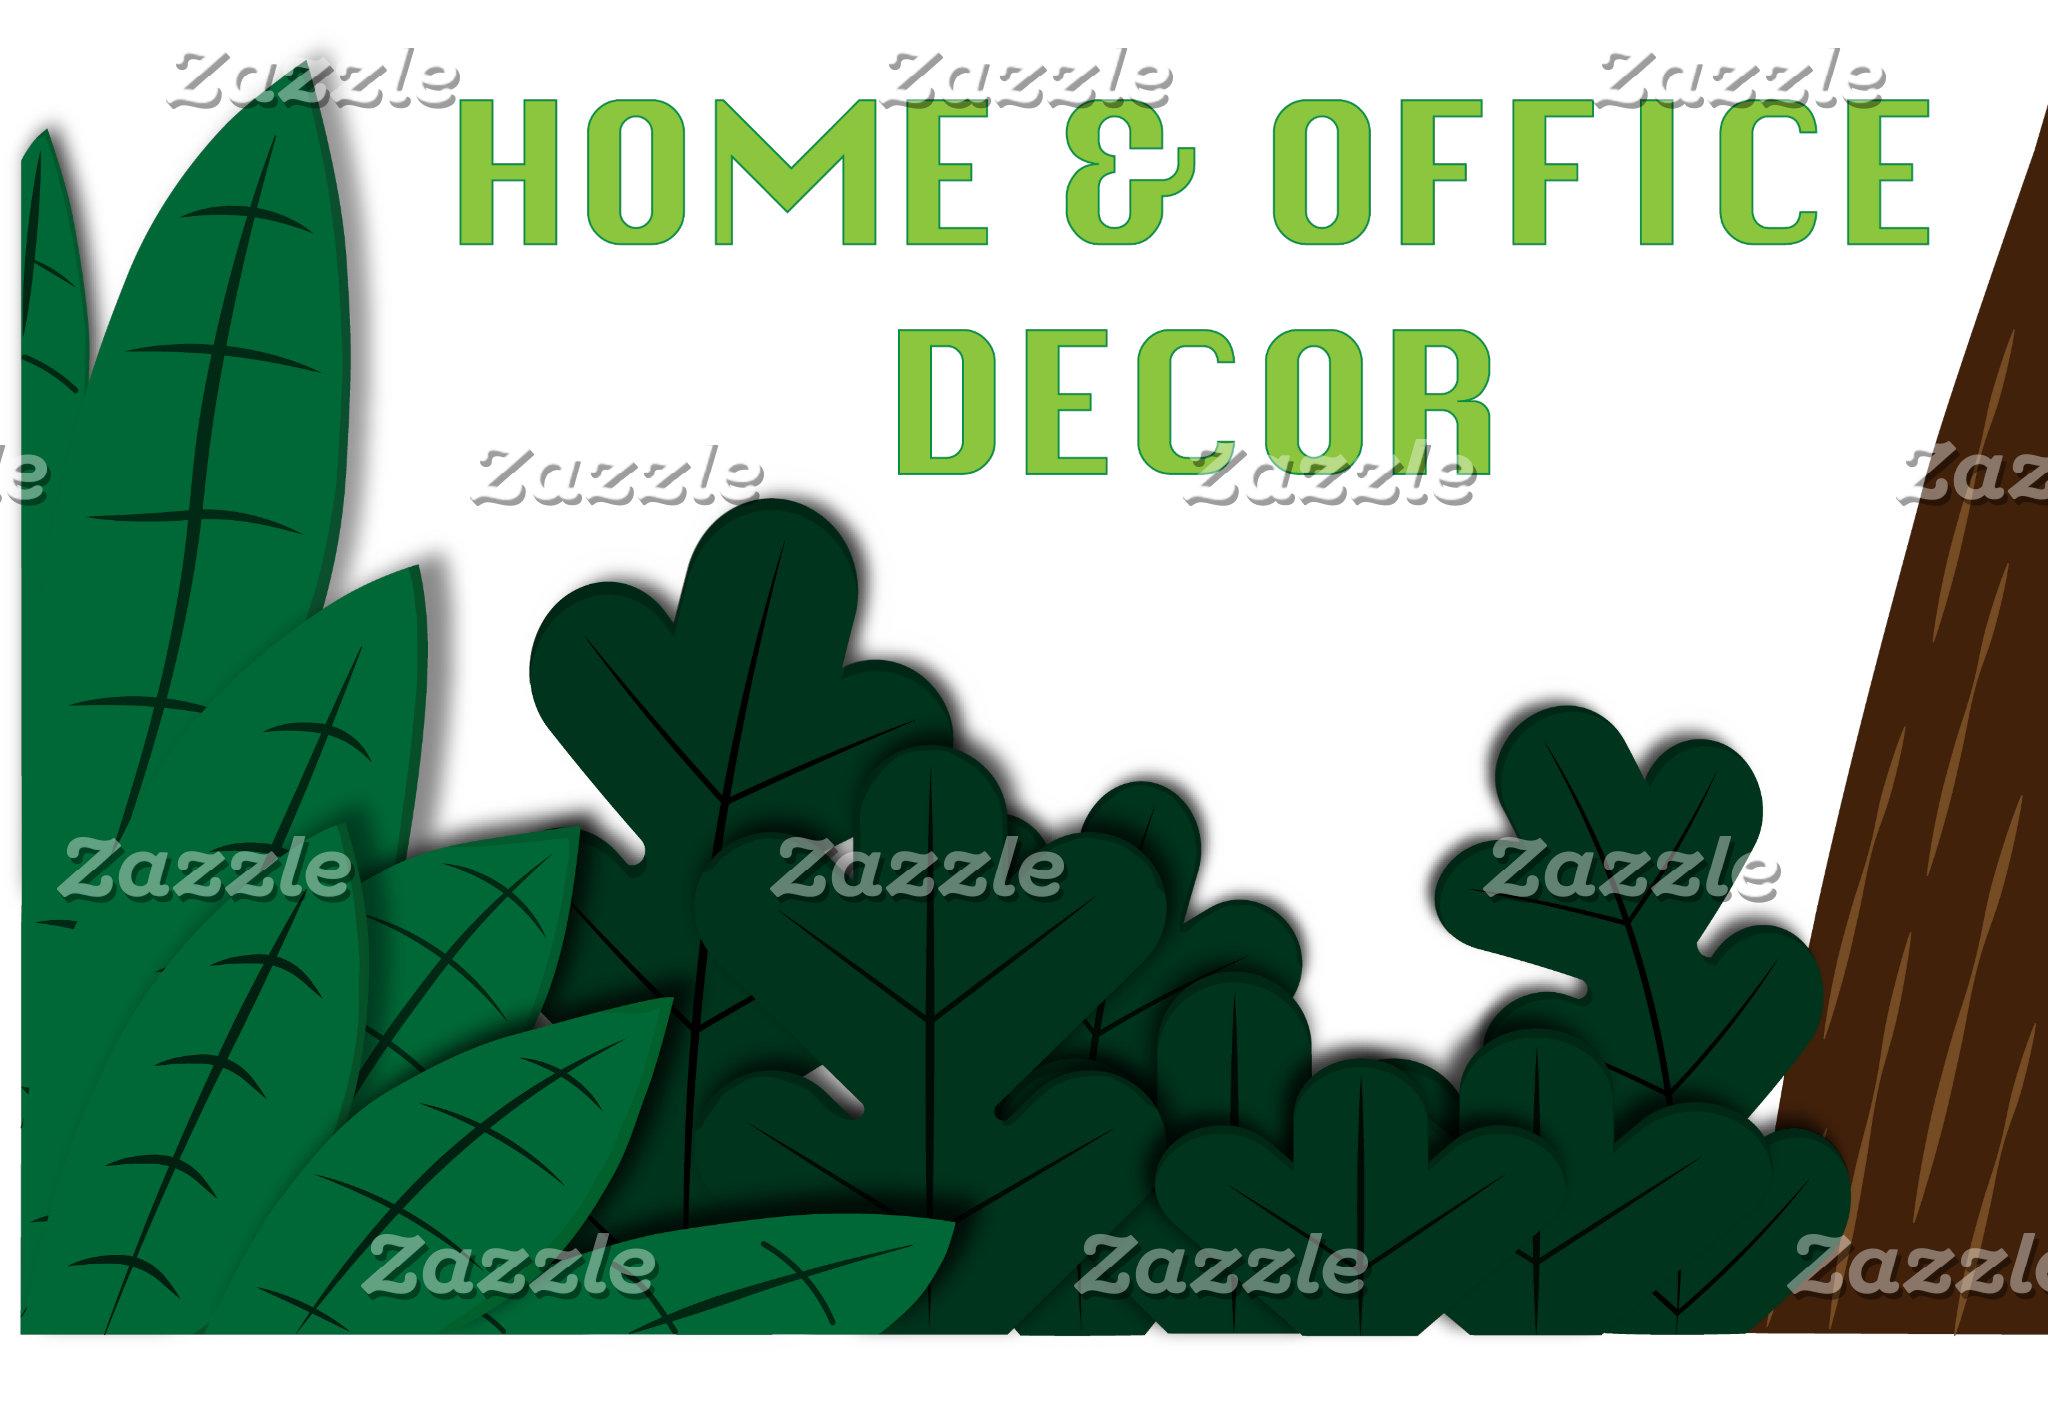 Home & Office Decor